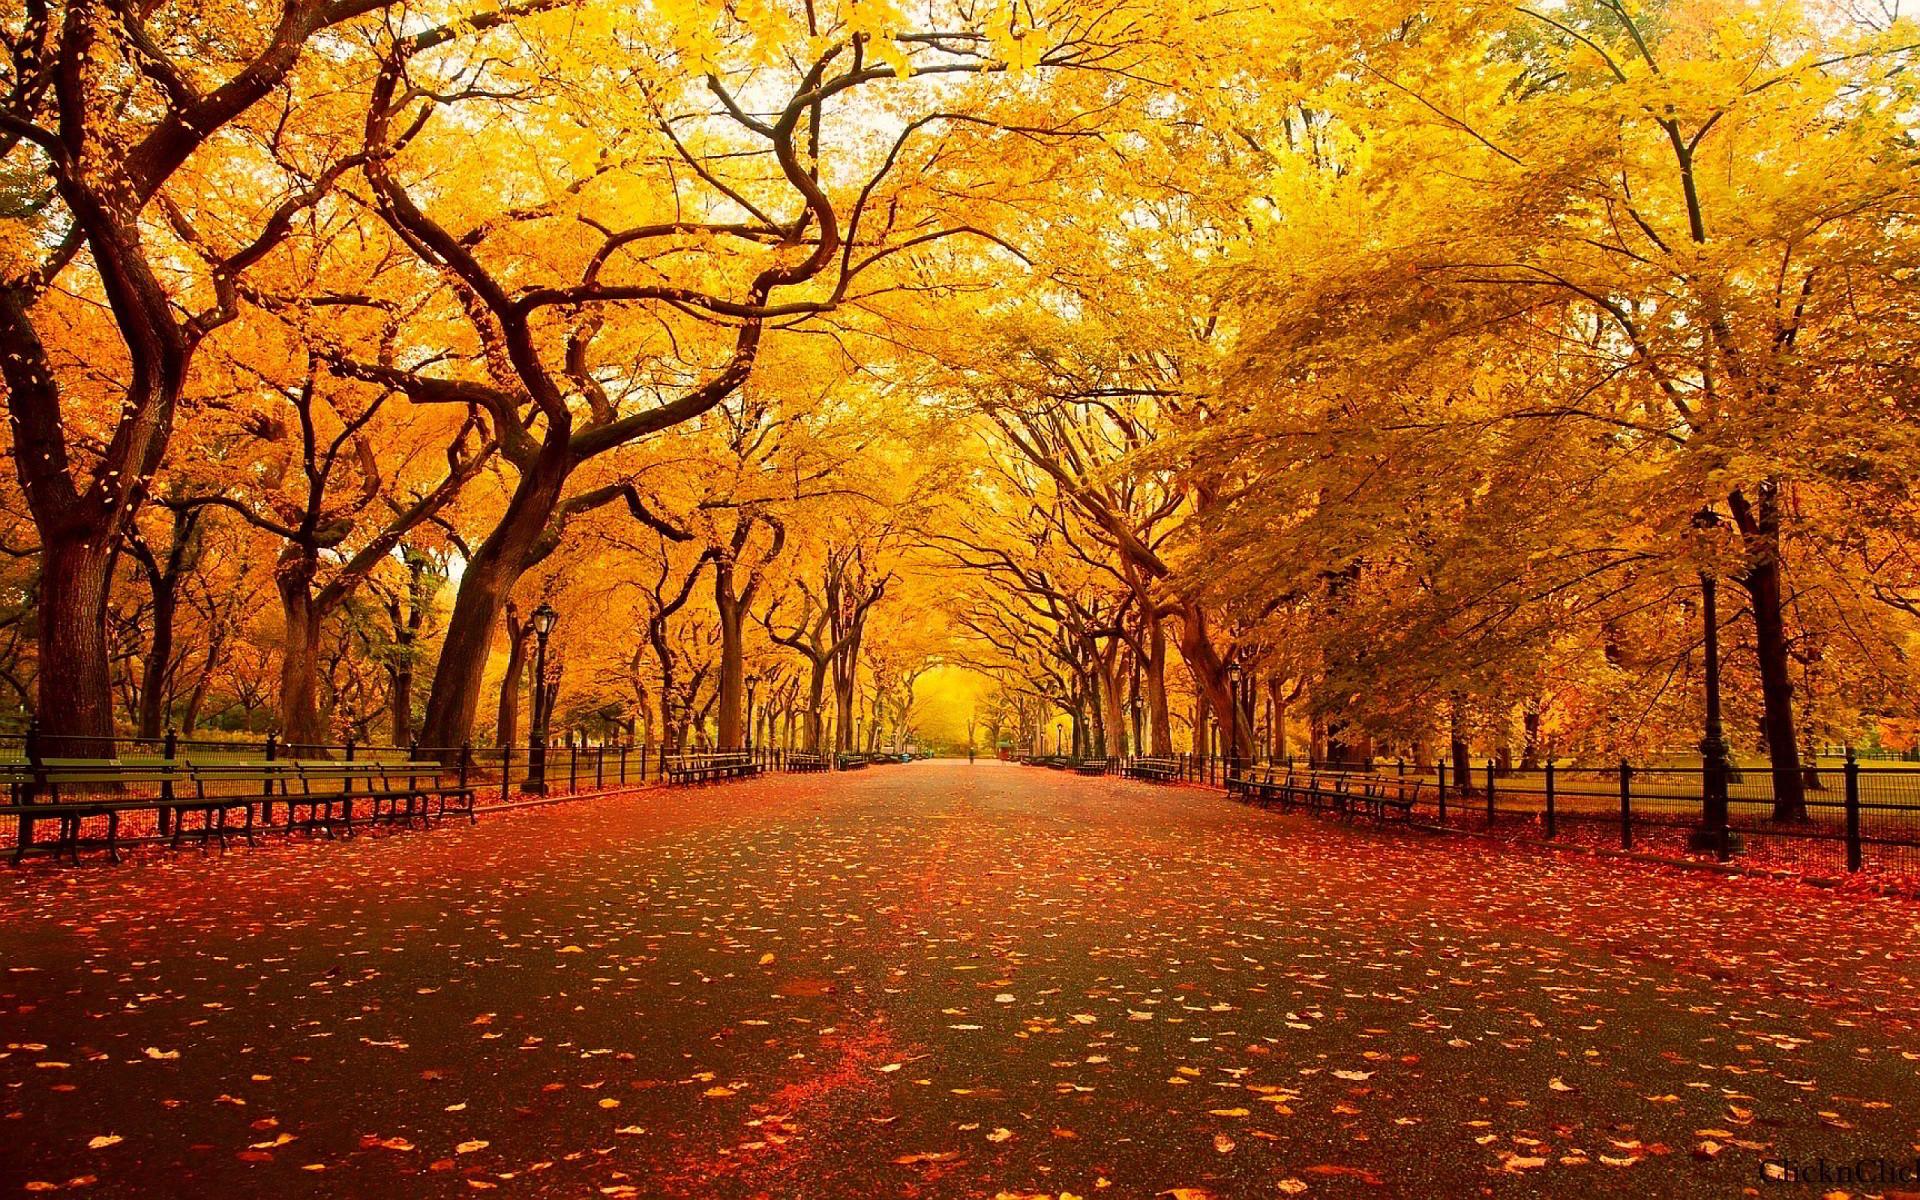 autumn images wallpaper